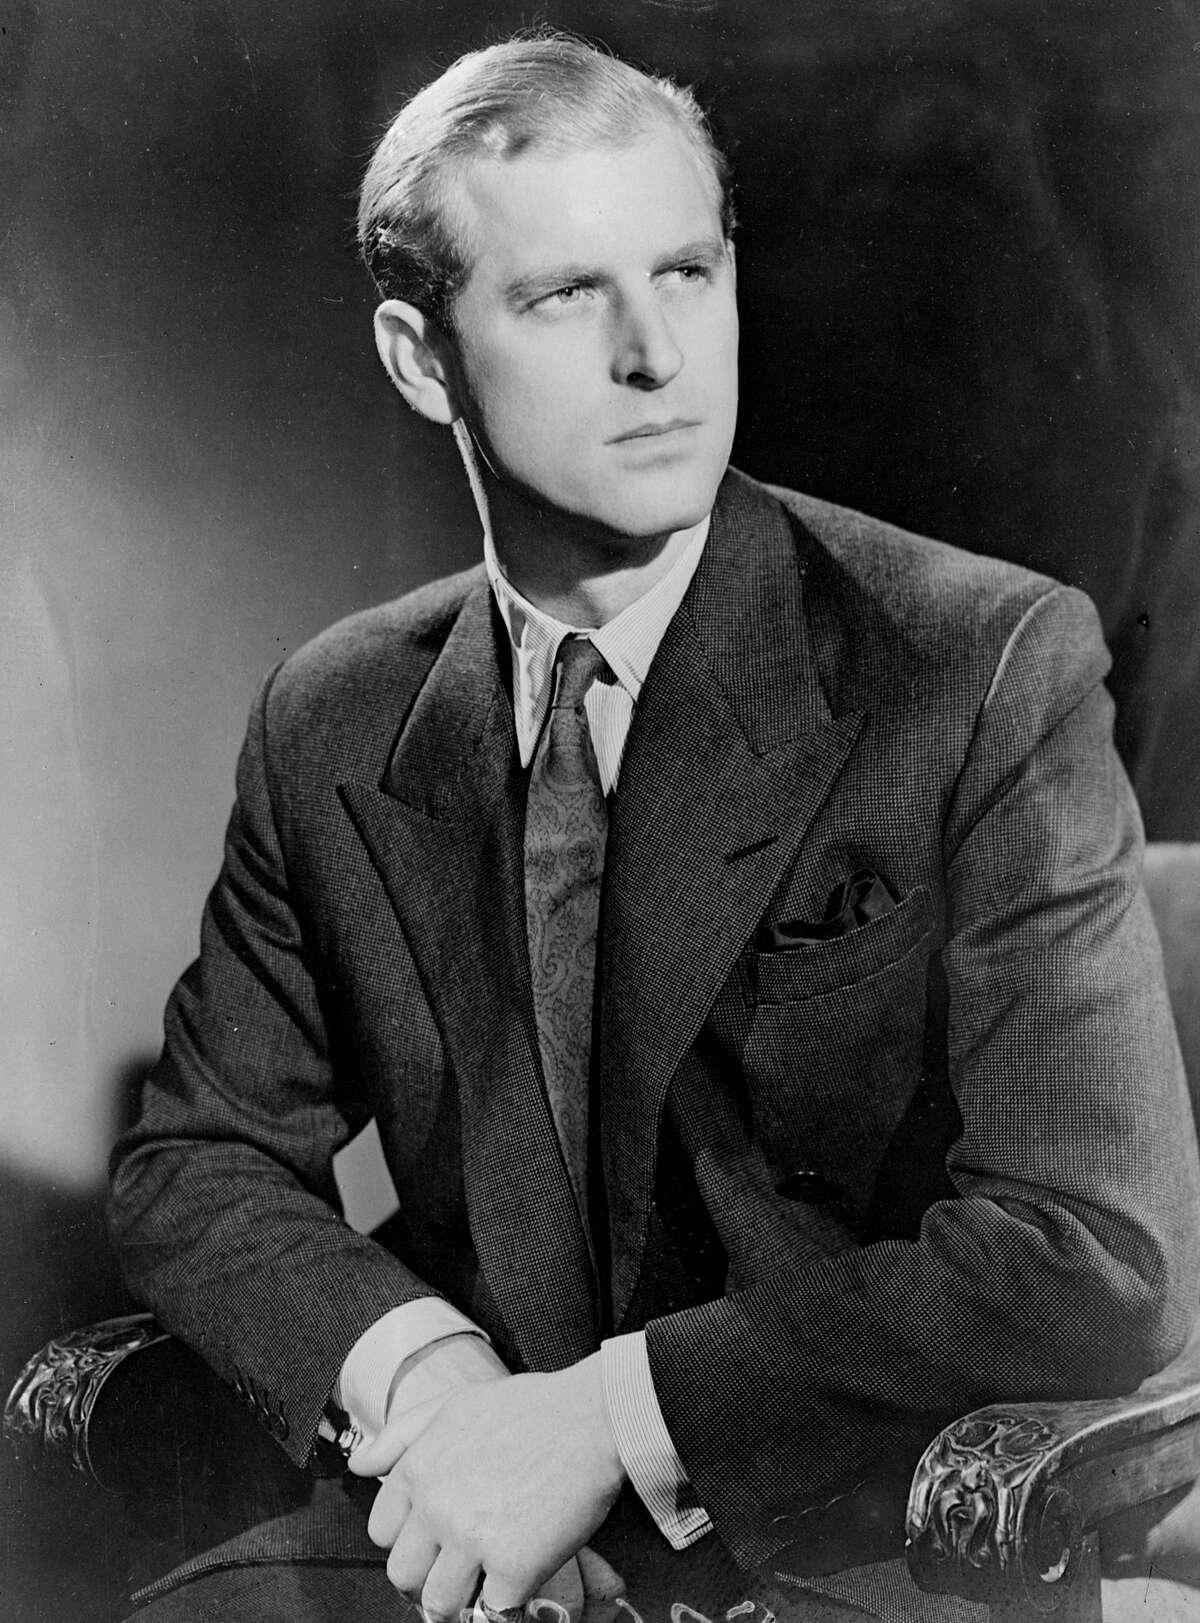 19th November 1947: Lieutenant Philip Mountbatten, later HRH the Duke of Edinburgh. (Photo by Keystone/Getty Images)